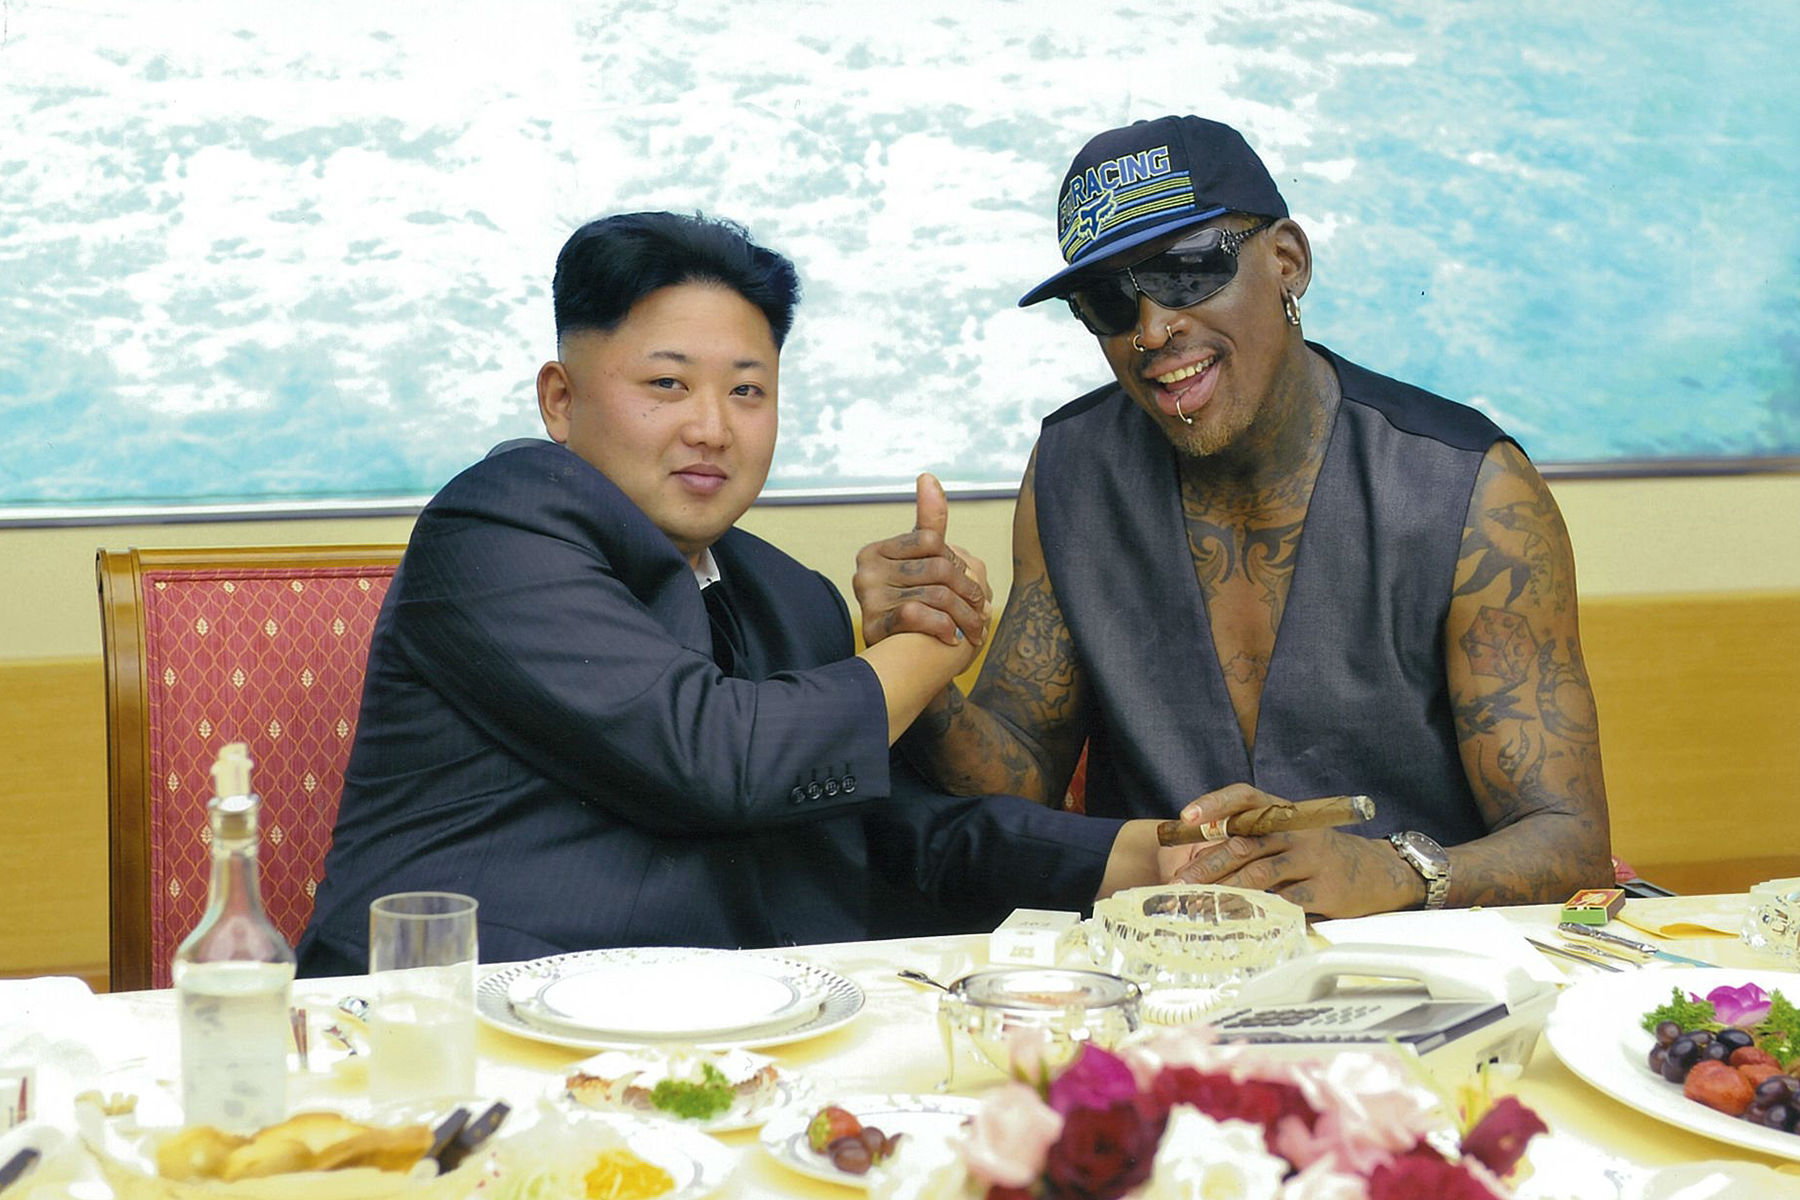 Dennis Rodman & Kim Jong-un